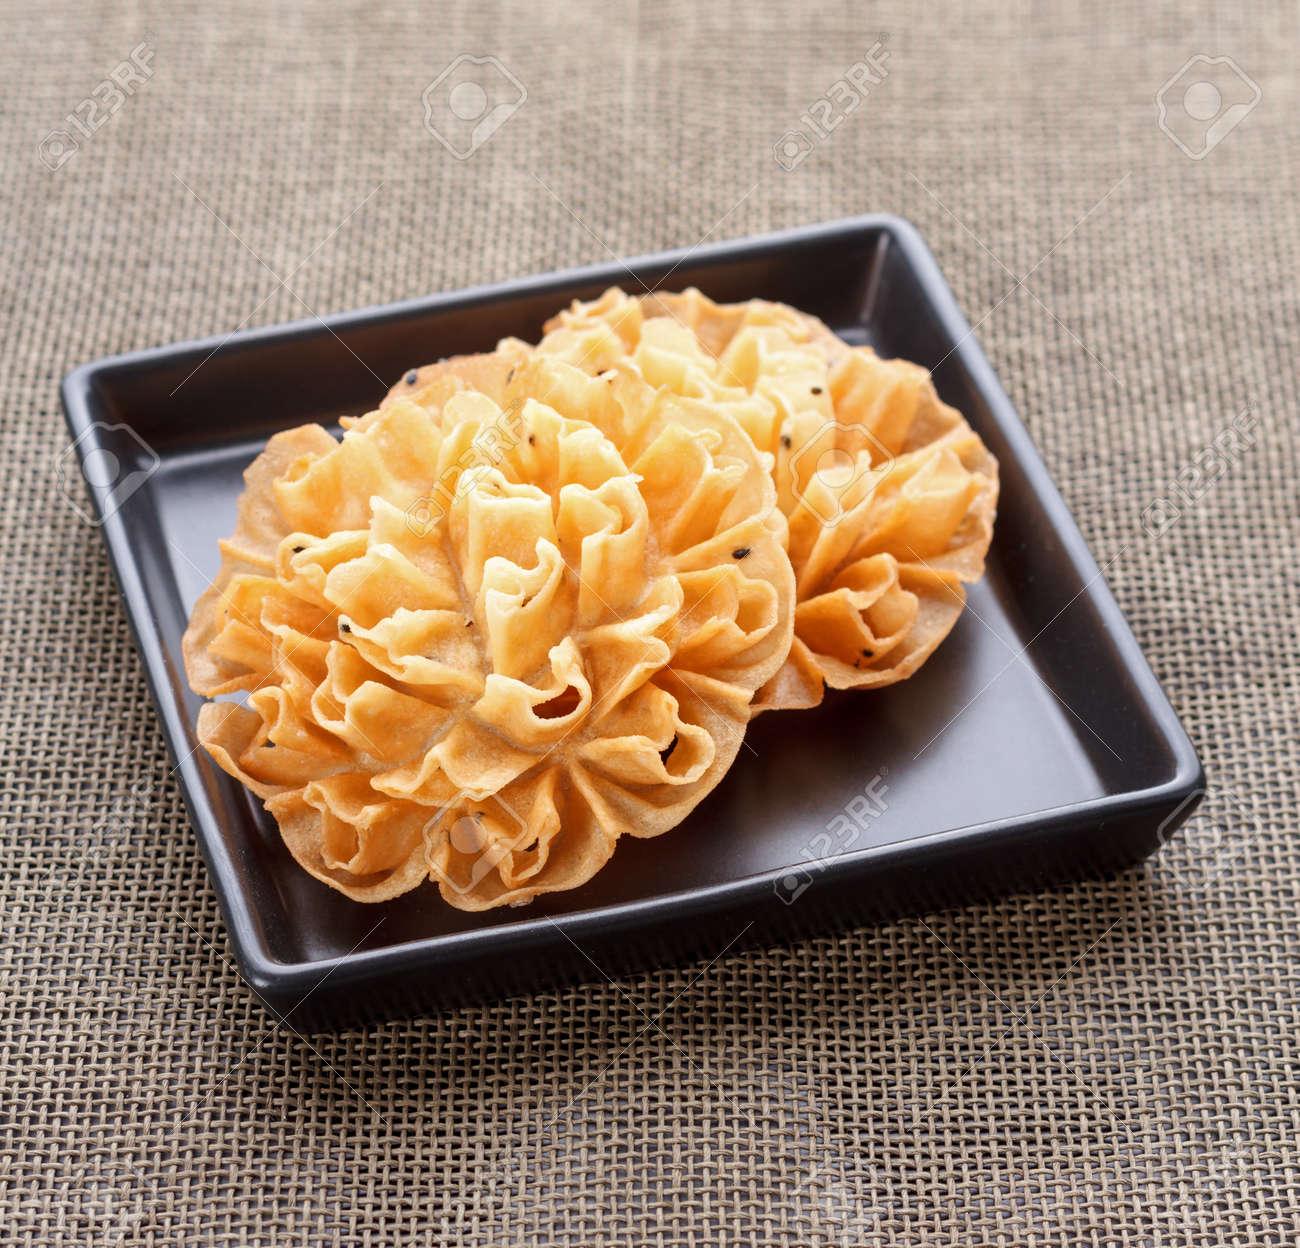 Crispy Lotus Blossom Cookie On Black Dish Dok Jog In Thai Stock